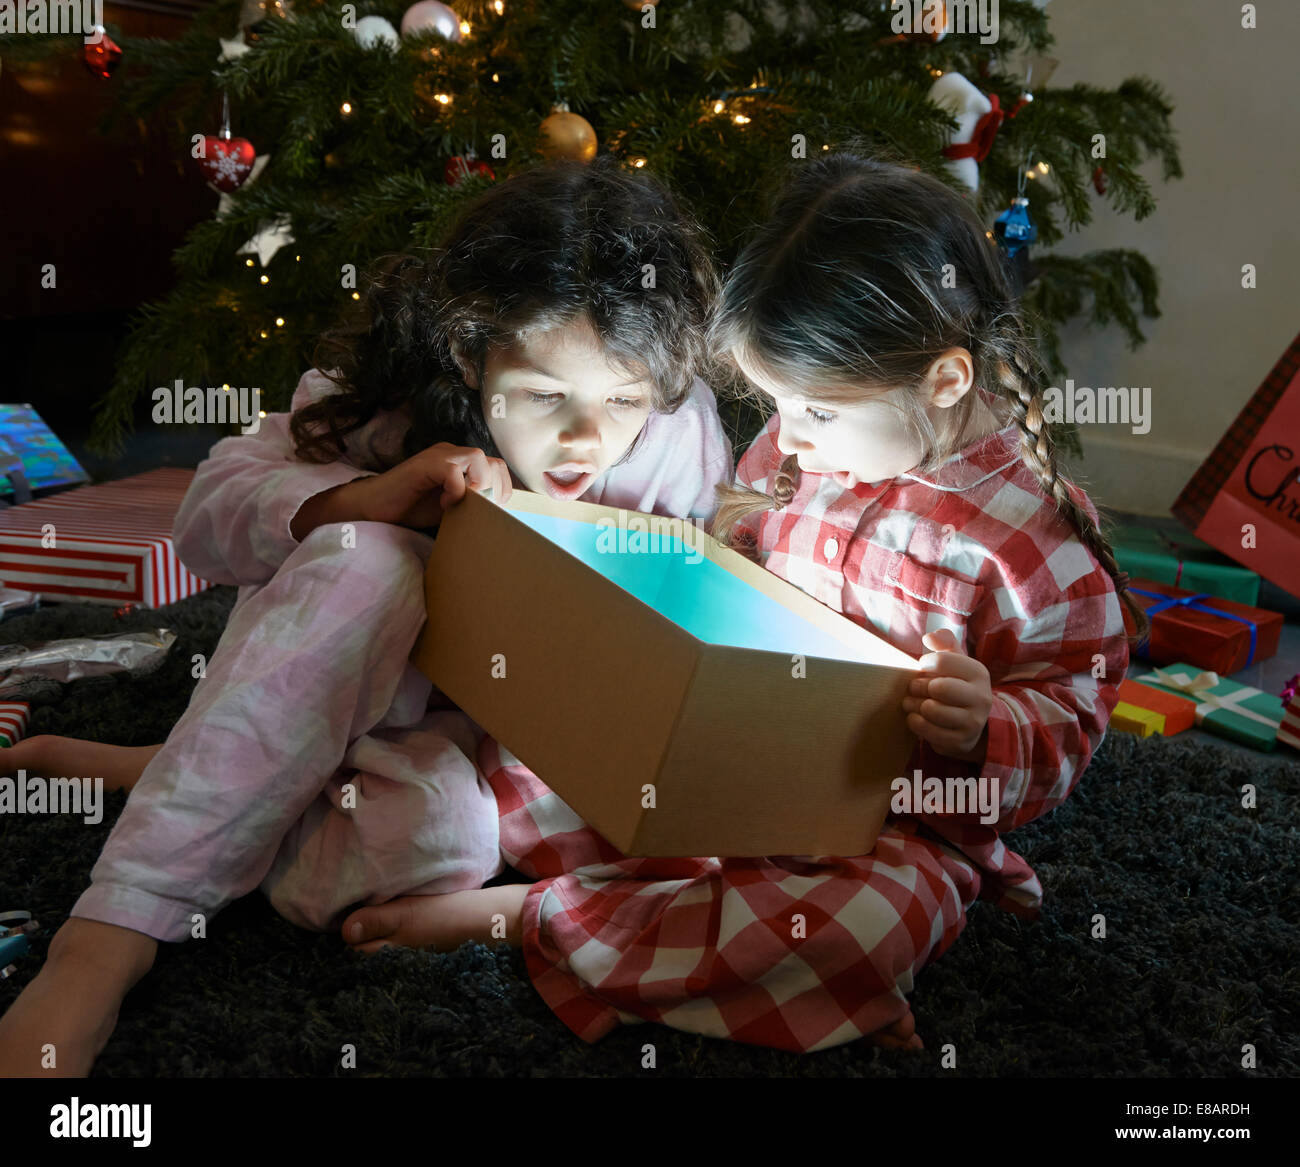 Dos hermanas atónito en desenvolver brillante caja de regalo de navidad Imagen De Stock